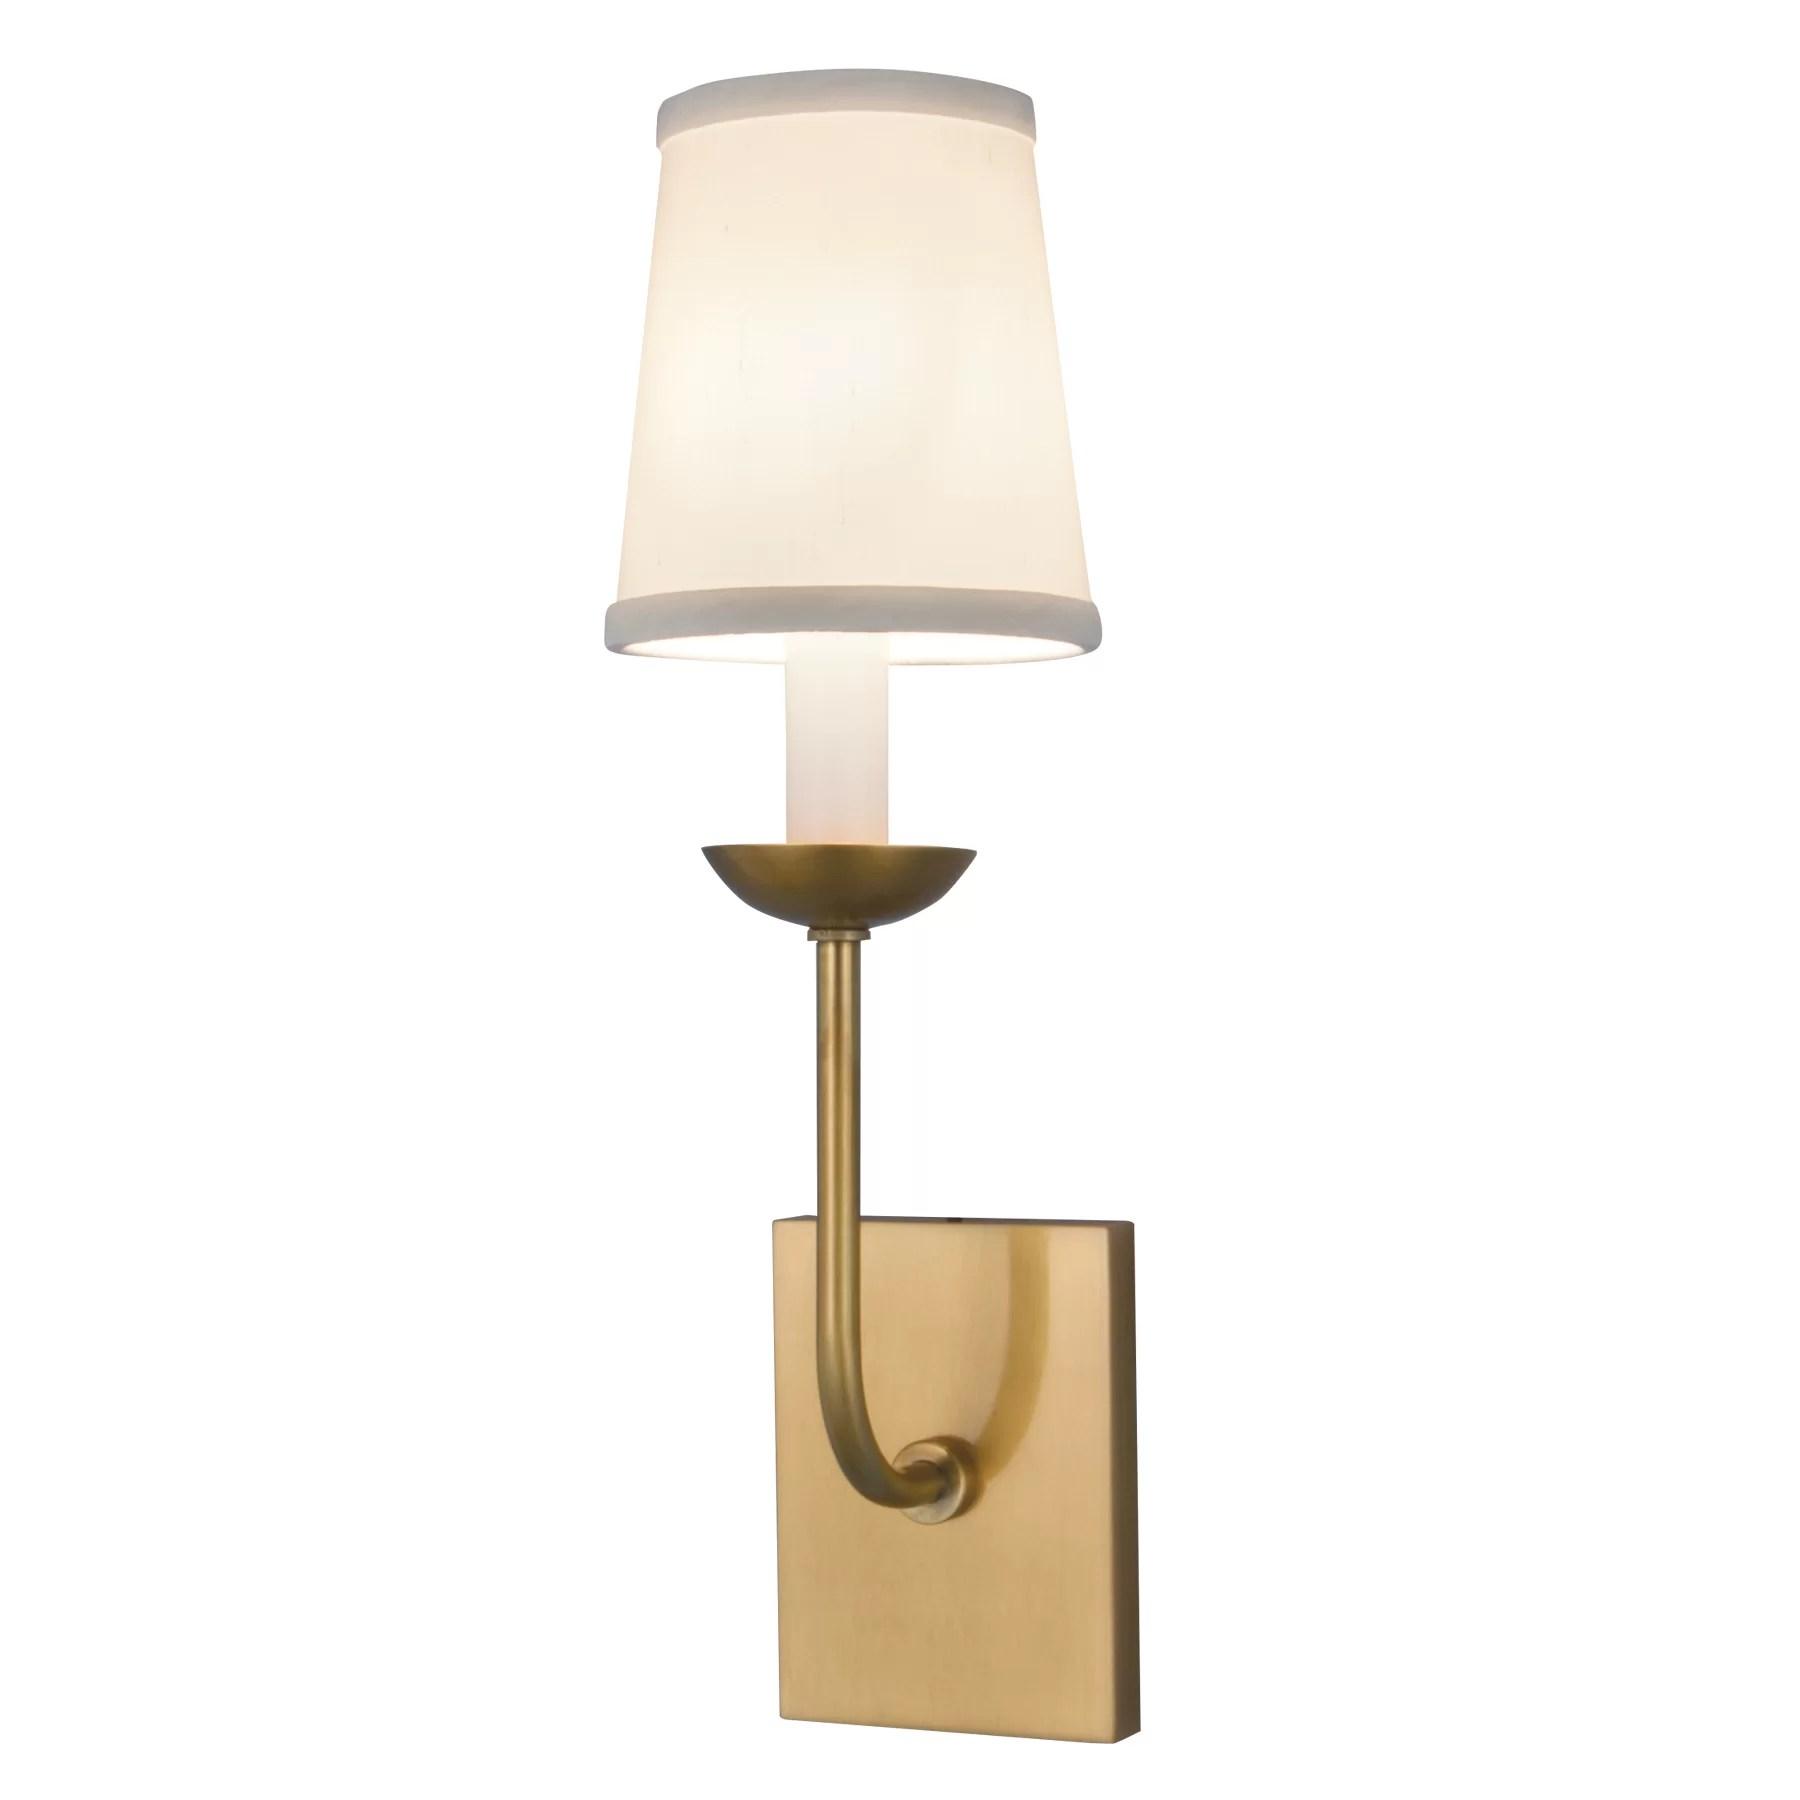 Norwell Lighting Circa 1 Light Wall Sconce & Reviews   Wayfair on Wayfair Bathroom Sconces id=36014